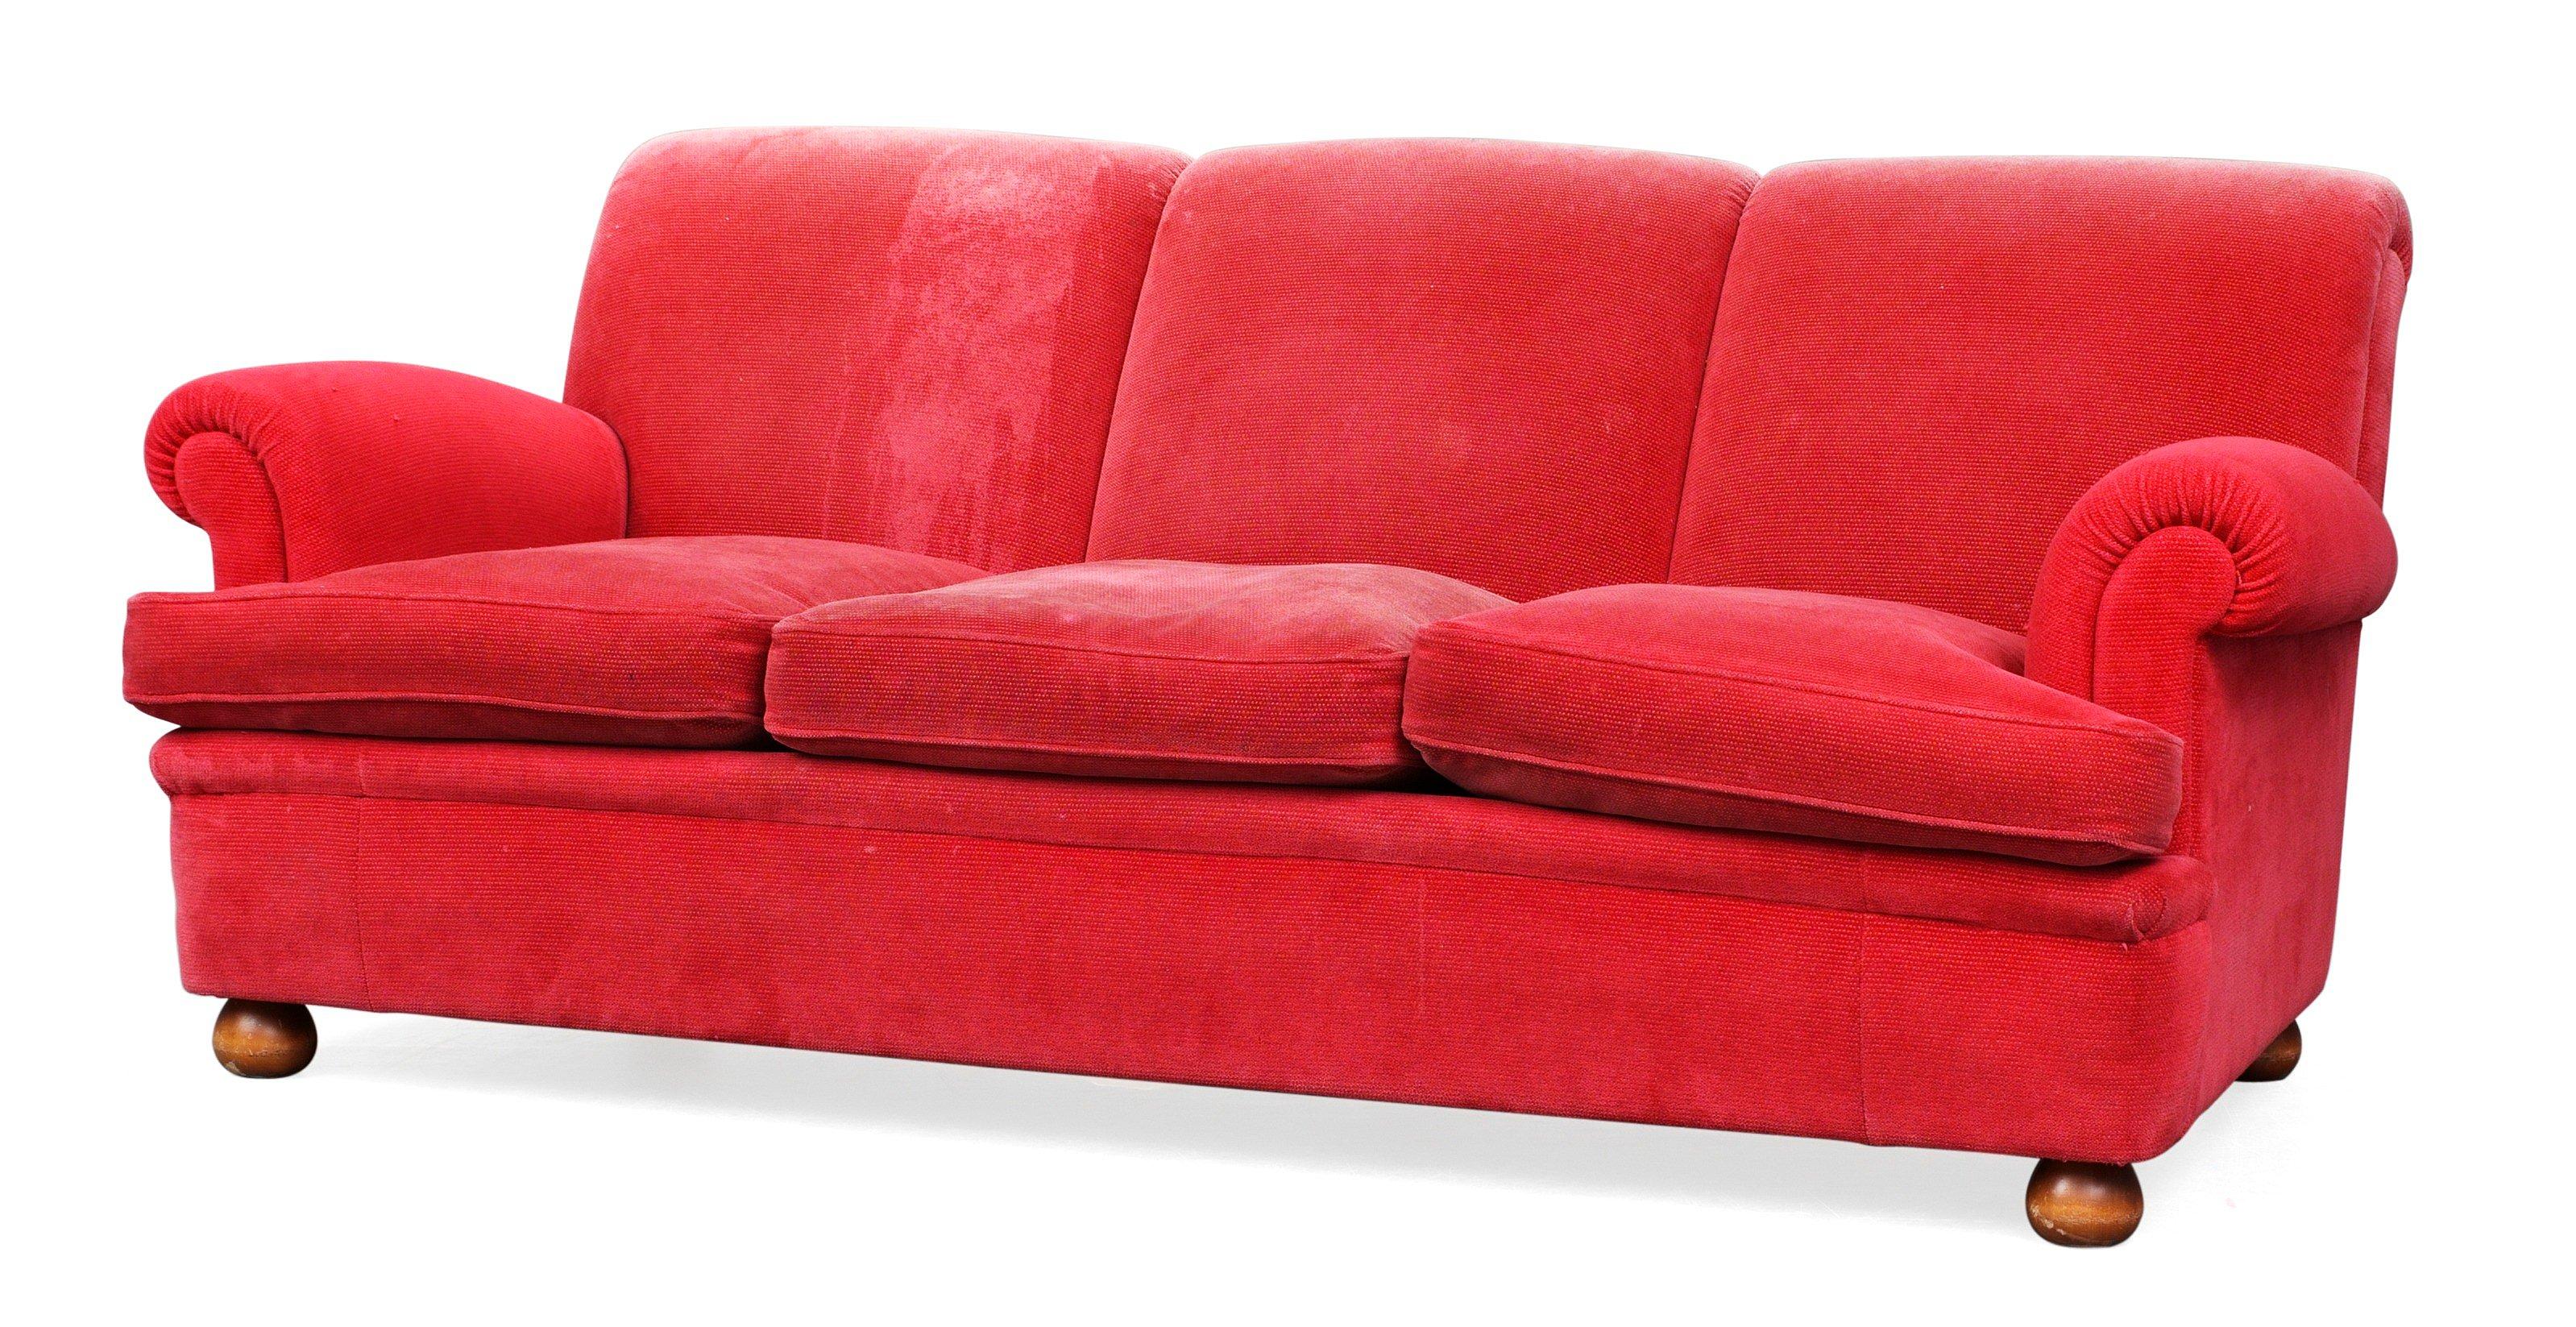 A Josef Frank Model 703 Sofa Firma Svenskt Tenn Bukowskis